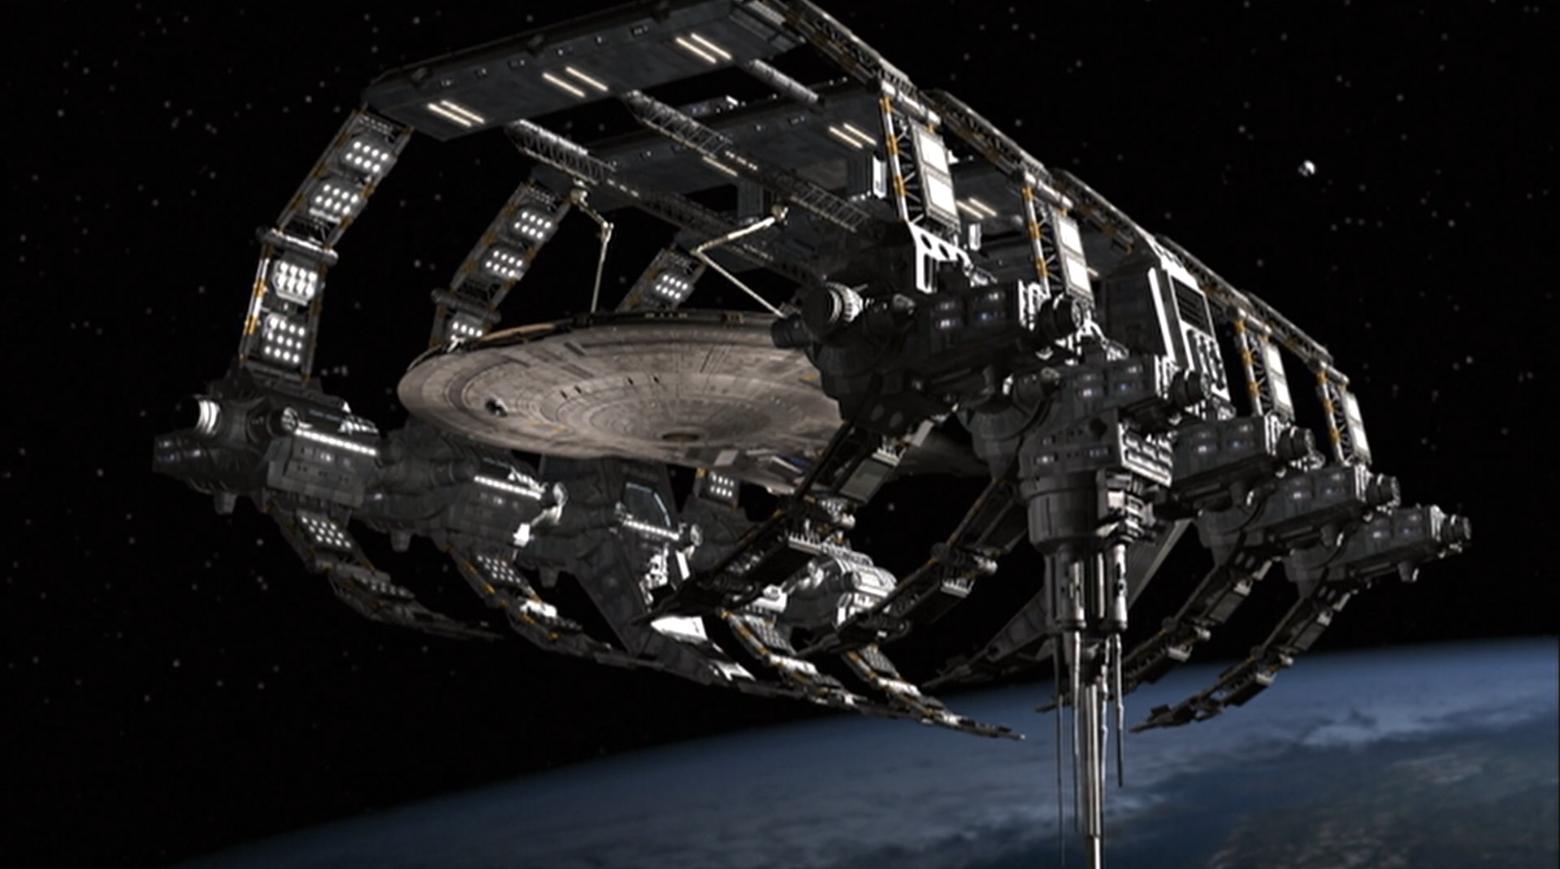 The Enterprise in dry-dock - Enterprise Star Trek Enterprise Season 1 Blu-ray Review